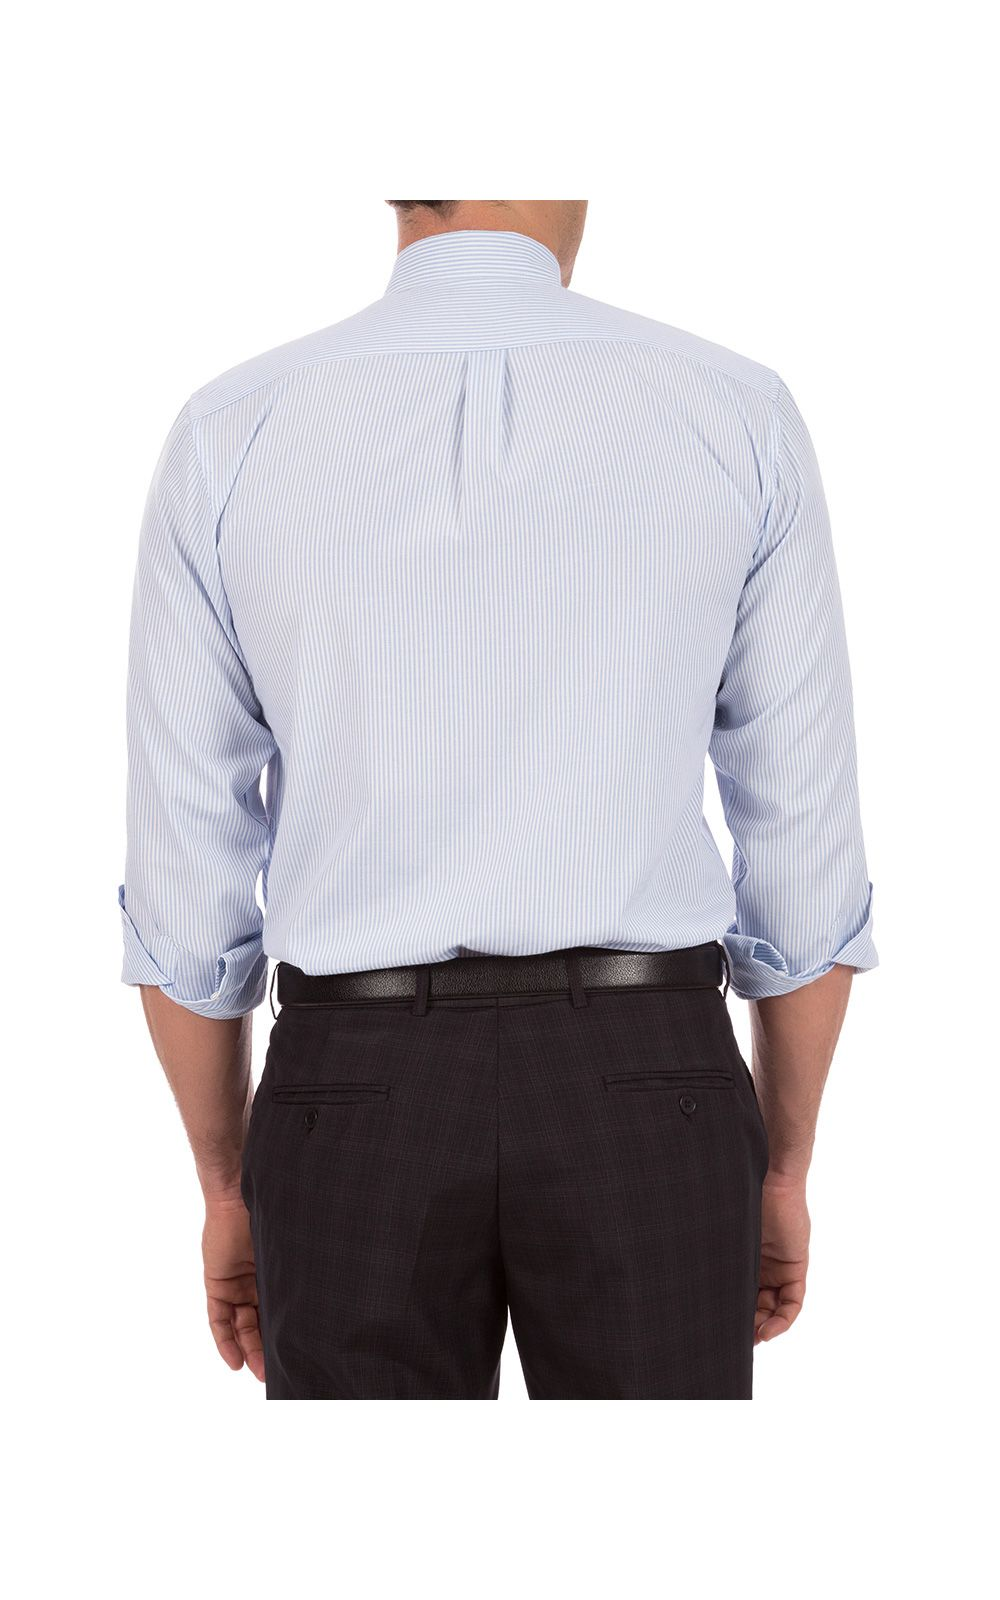 Foto 2 - Camisa Social Masculina Azul Listrada